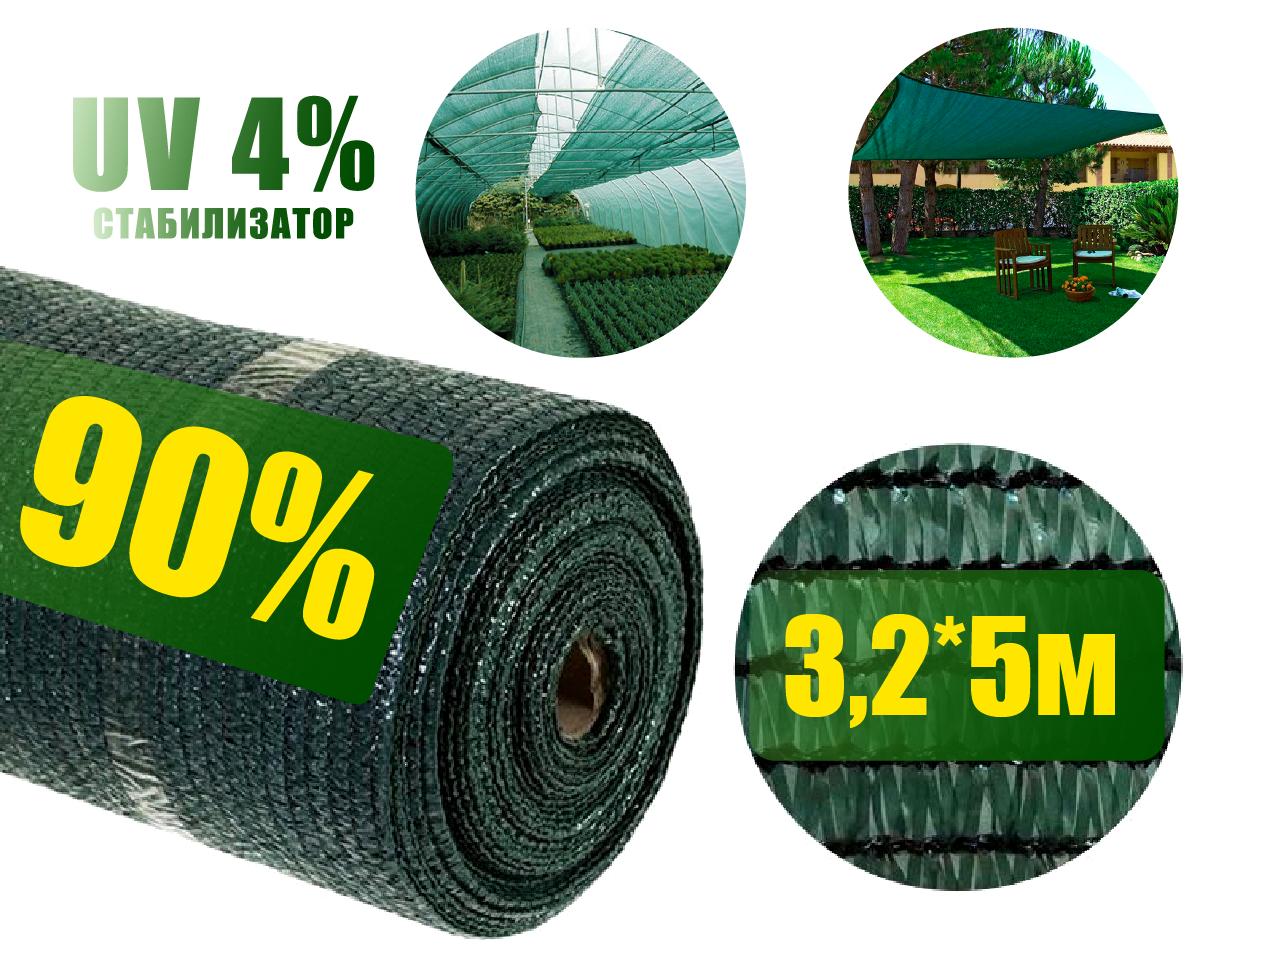 Затеняющая сетка 90 %  3,2м*5м зеленая